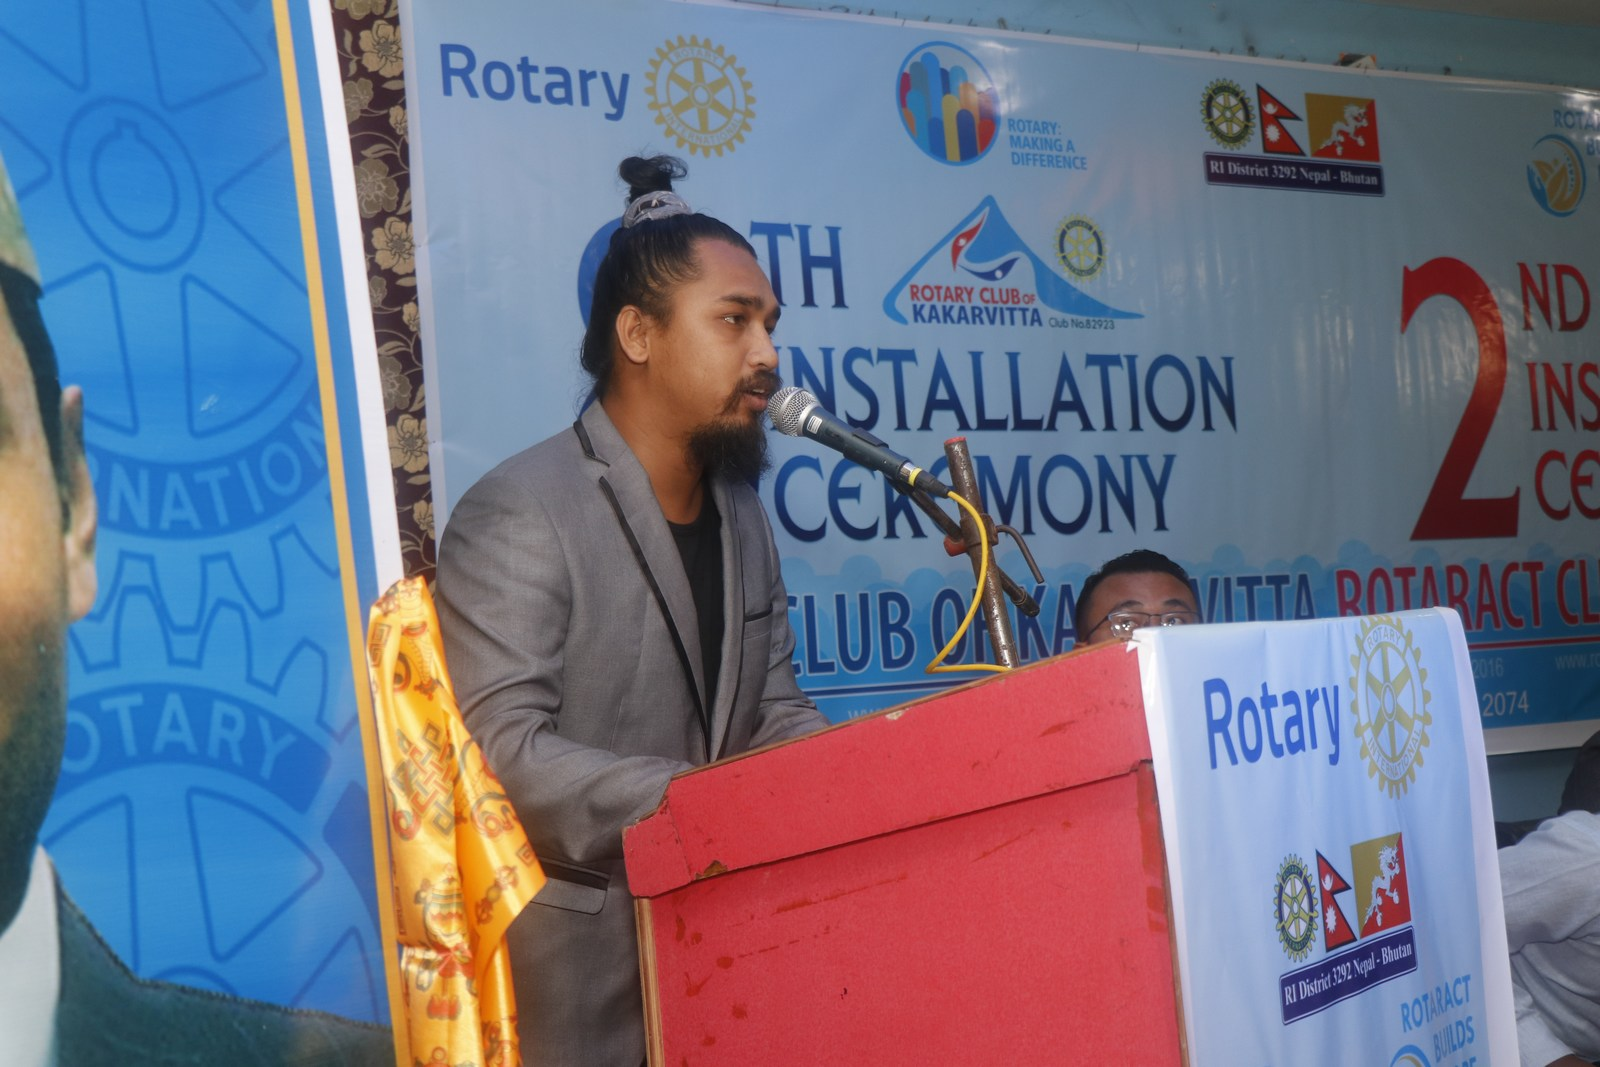 8th-Installation-Ceremony-Rotary-Club-of-Kakarvitta-54